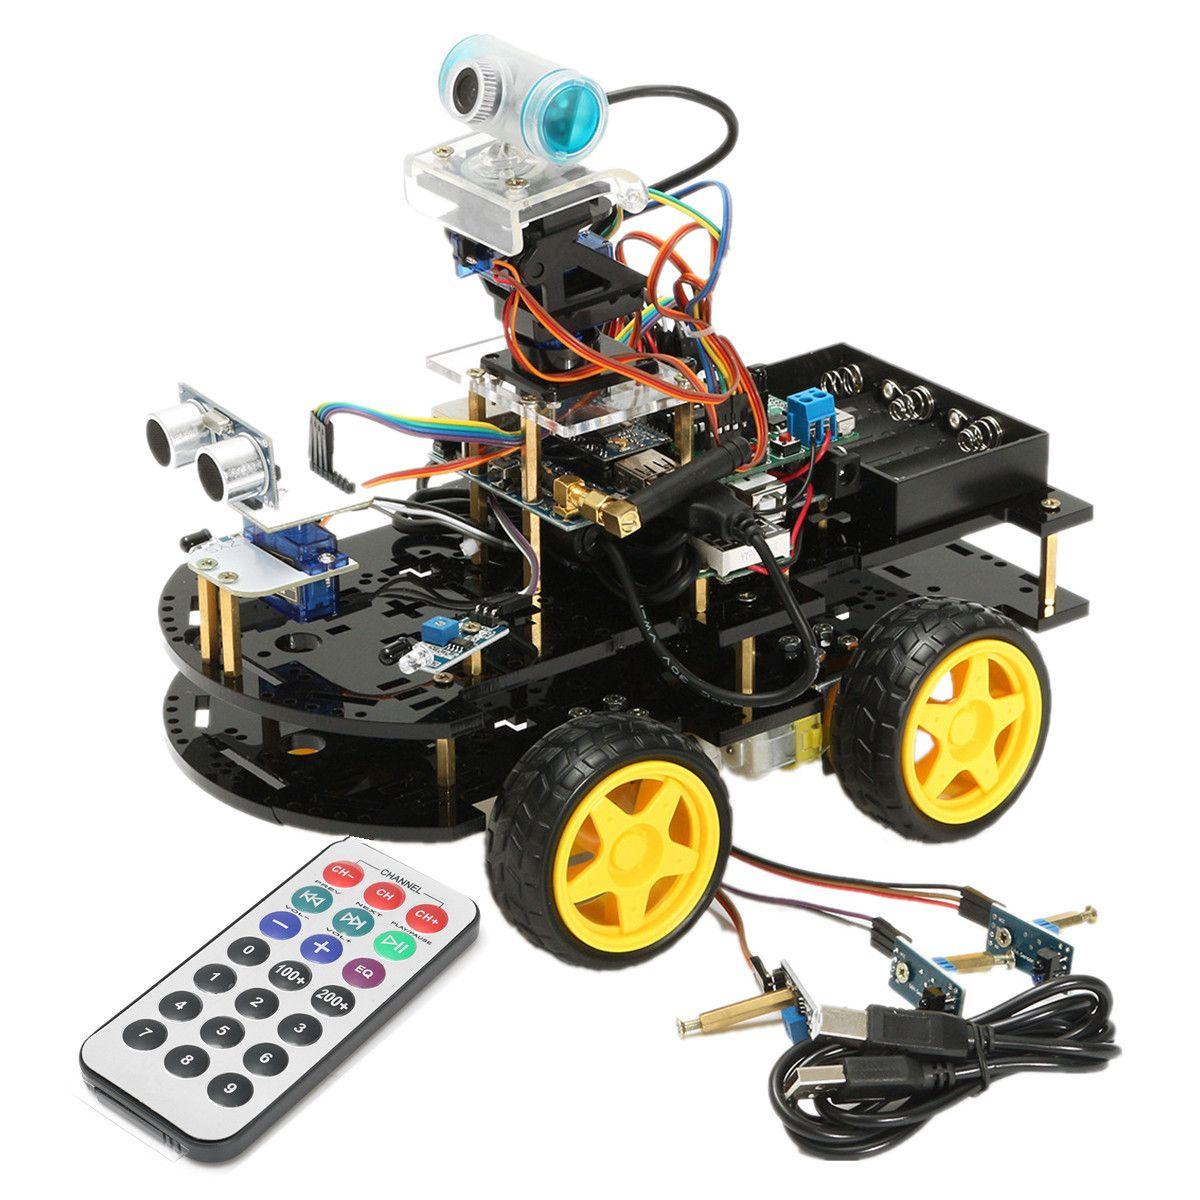 Diy 4wd wifi programmable smart robot car kit support ios system diy 4wd wifi programmable smart robot car kit support ios system malvernweather Choice Image